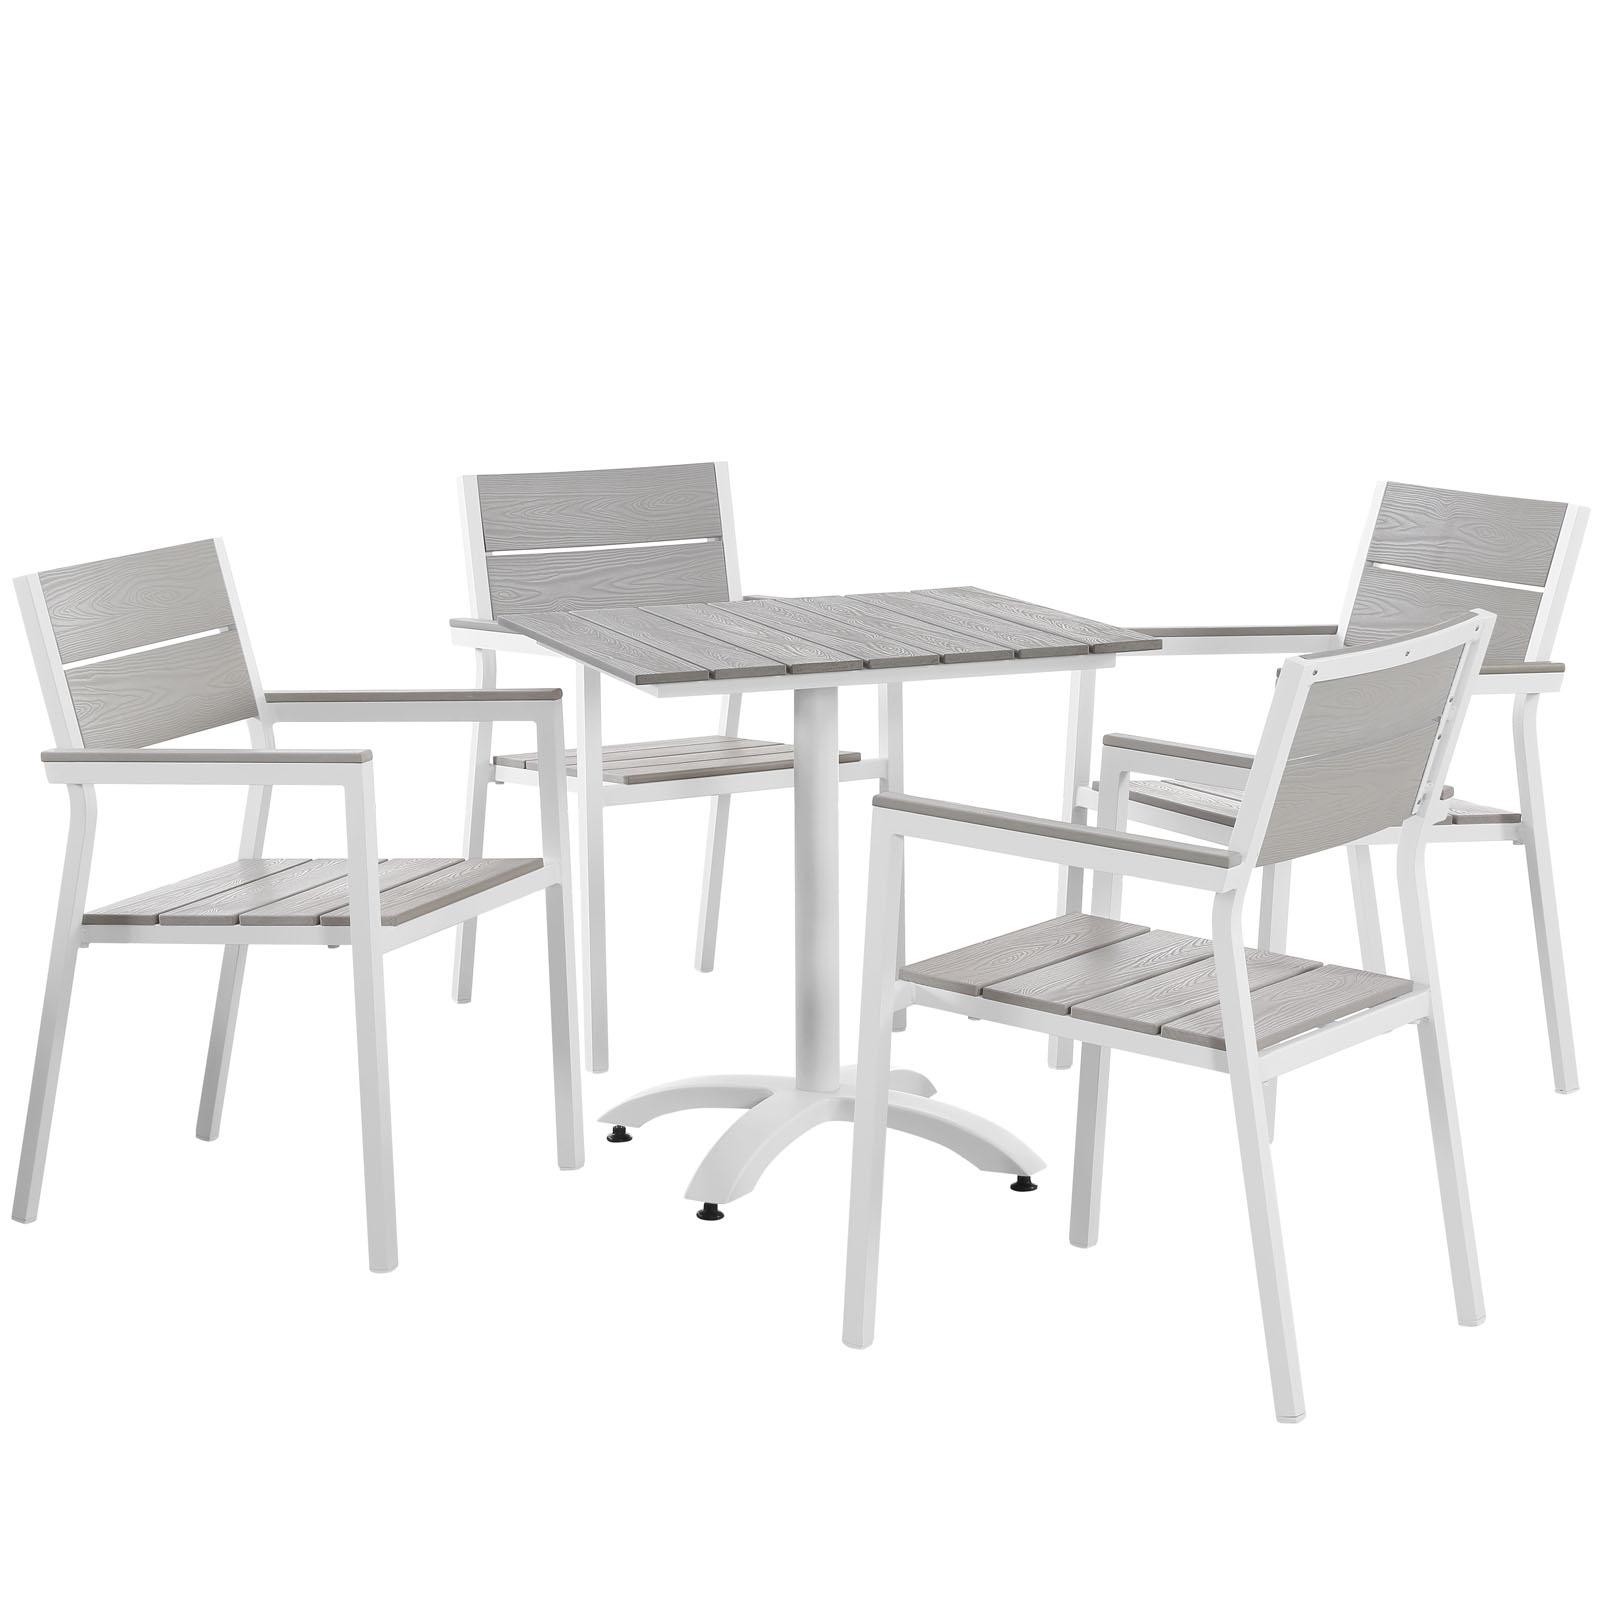 Modern Urban Contemporary 5 pcs Outdoor Patio Dining Set, White Light Grey Steel